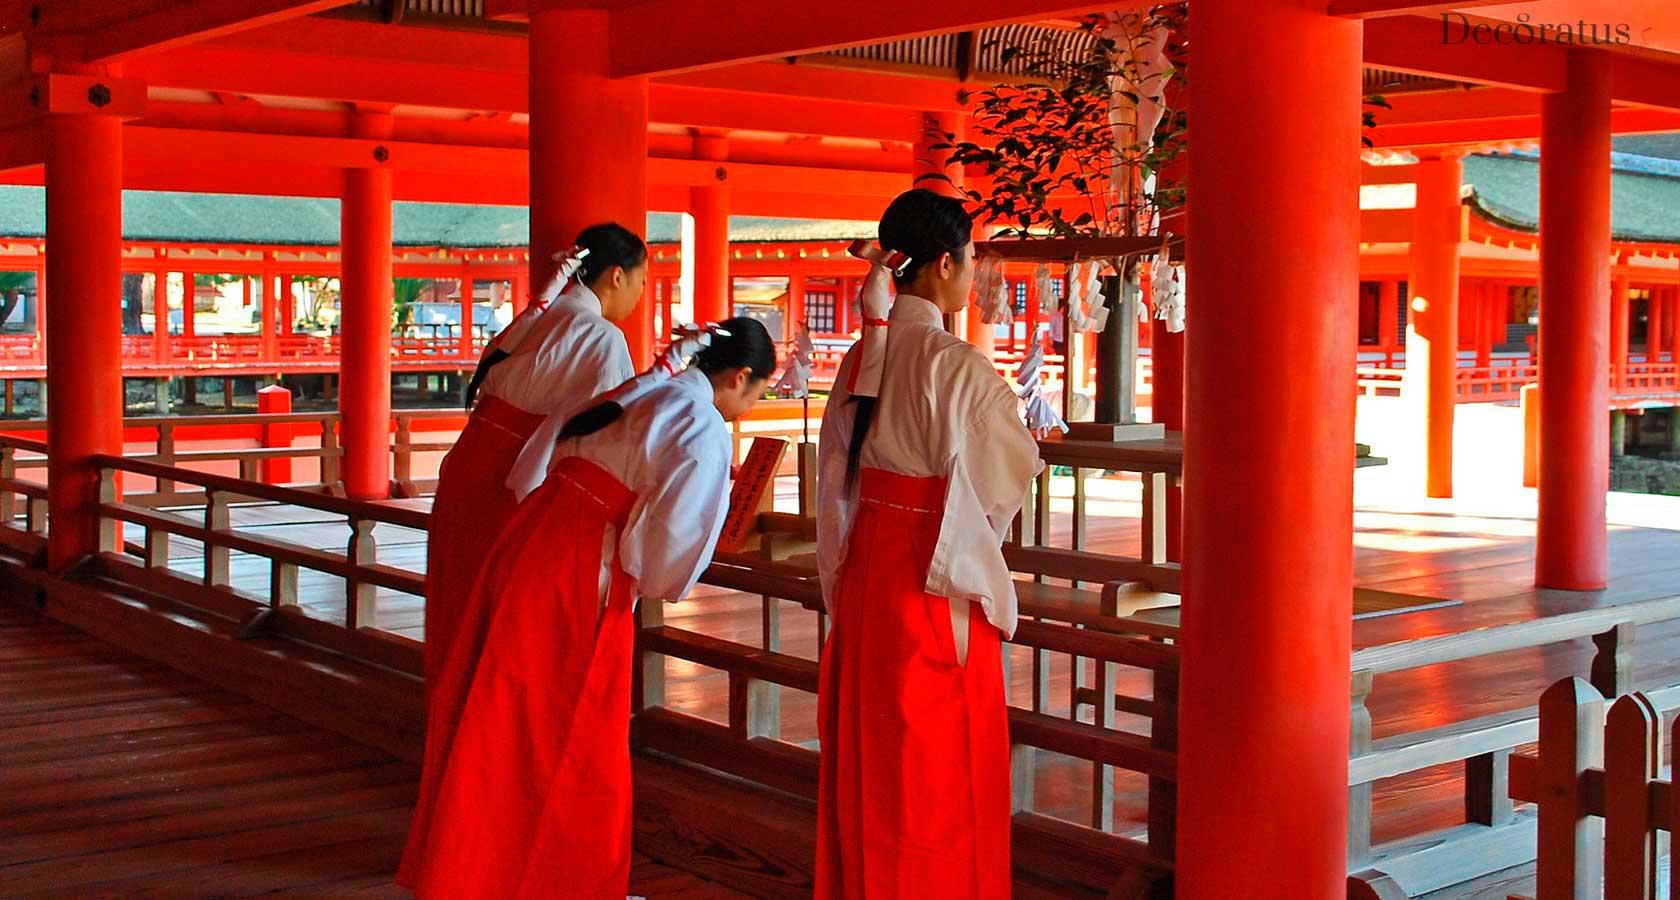 храм ицукусима япония